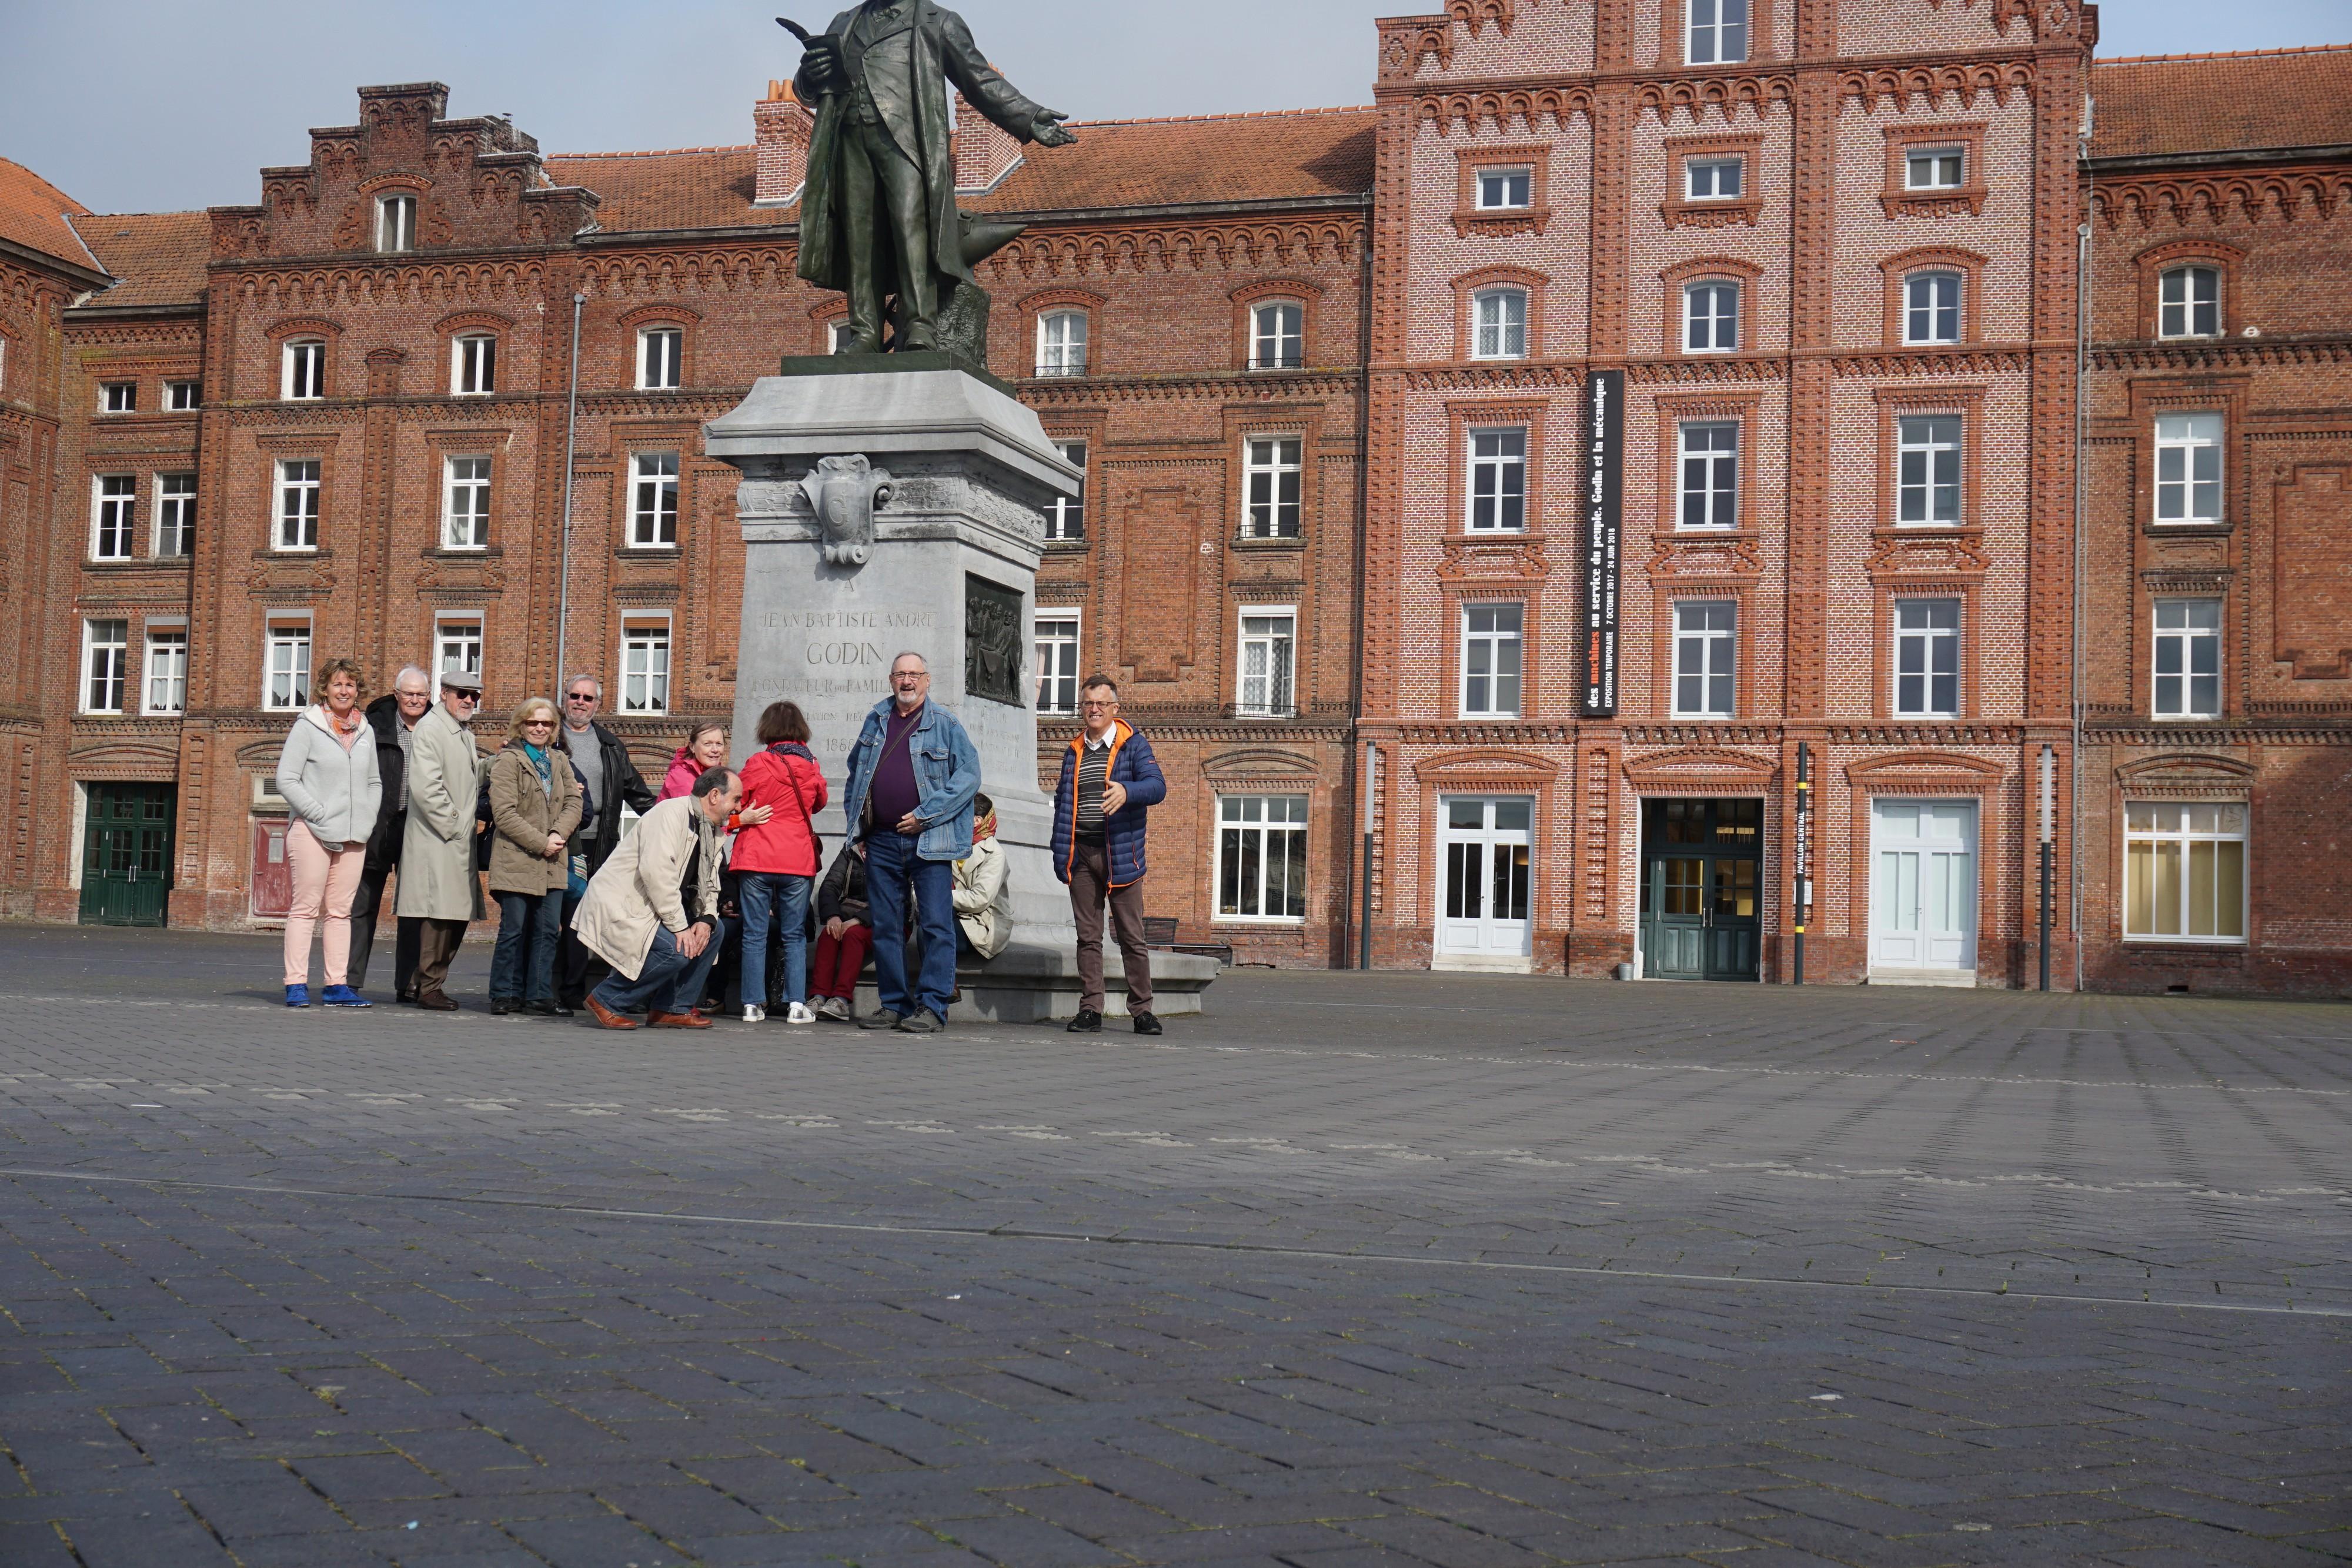 Devant la statue de Godin